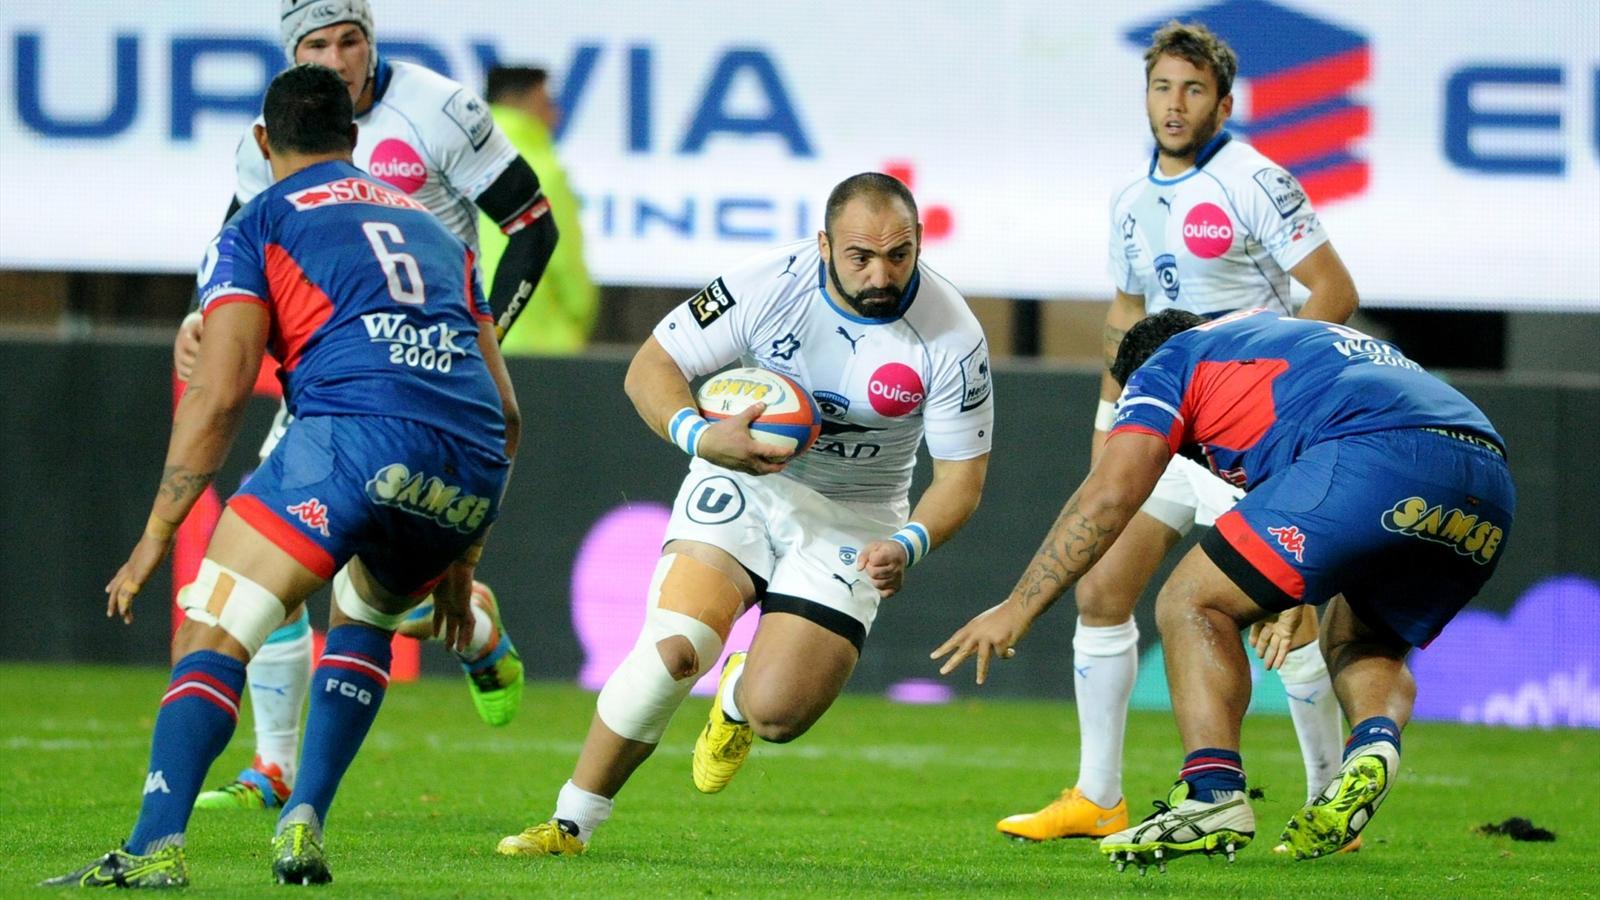 Mikheil Nariashvili (Montpellier) face à Grenoble - 16 octobre